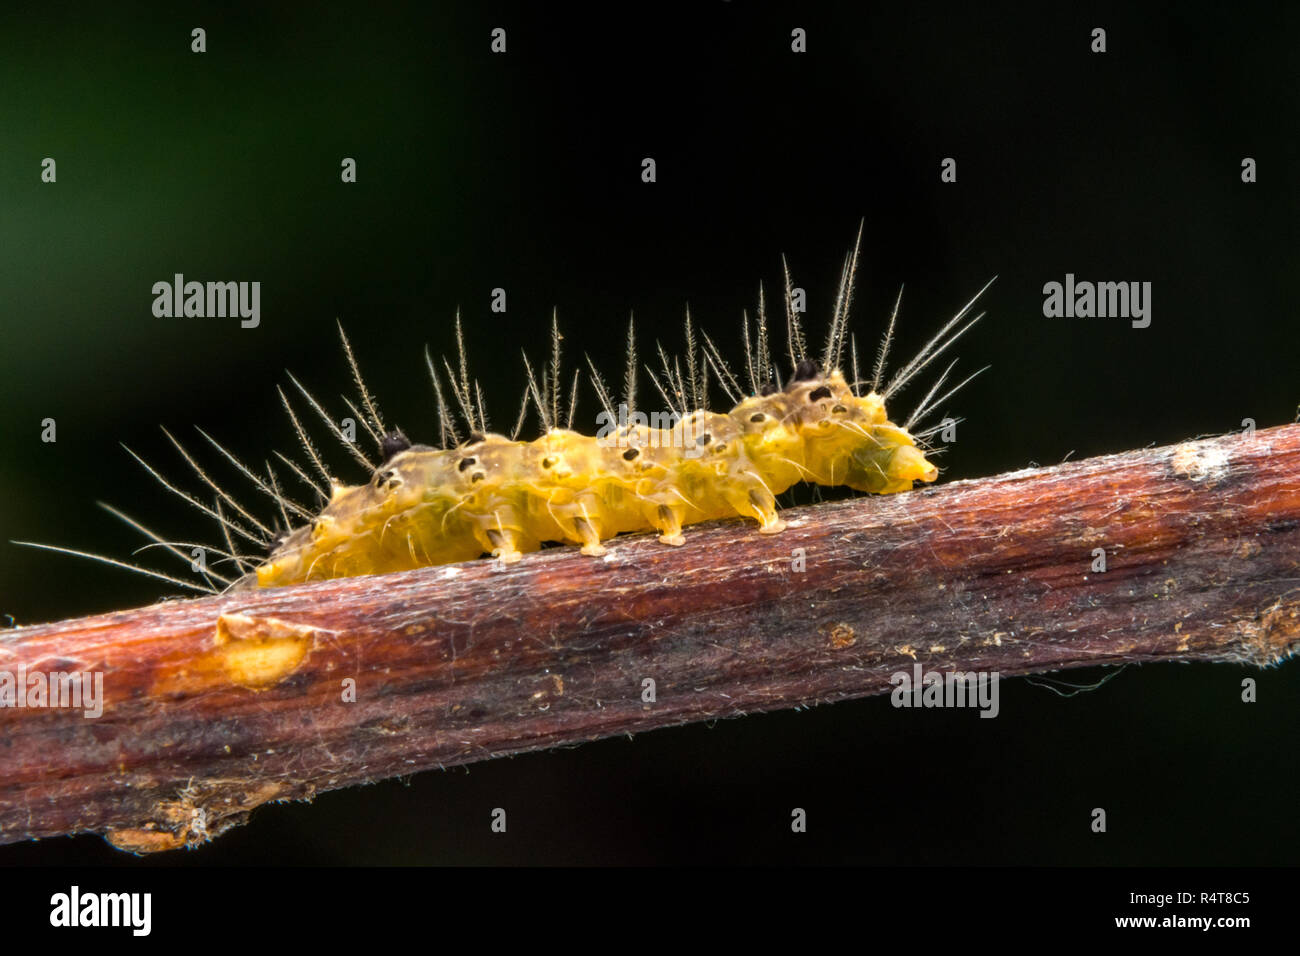 marco photography-yellow caterpillar Stock Photo